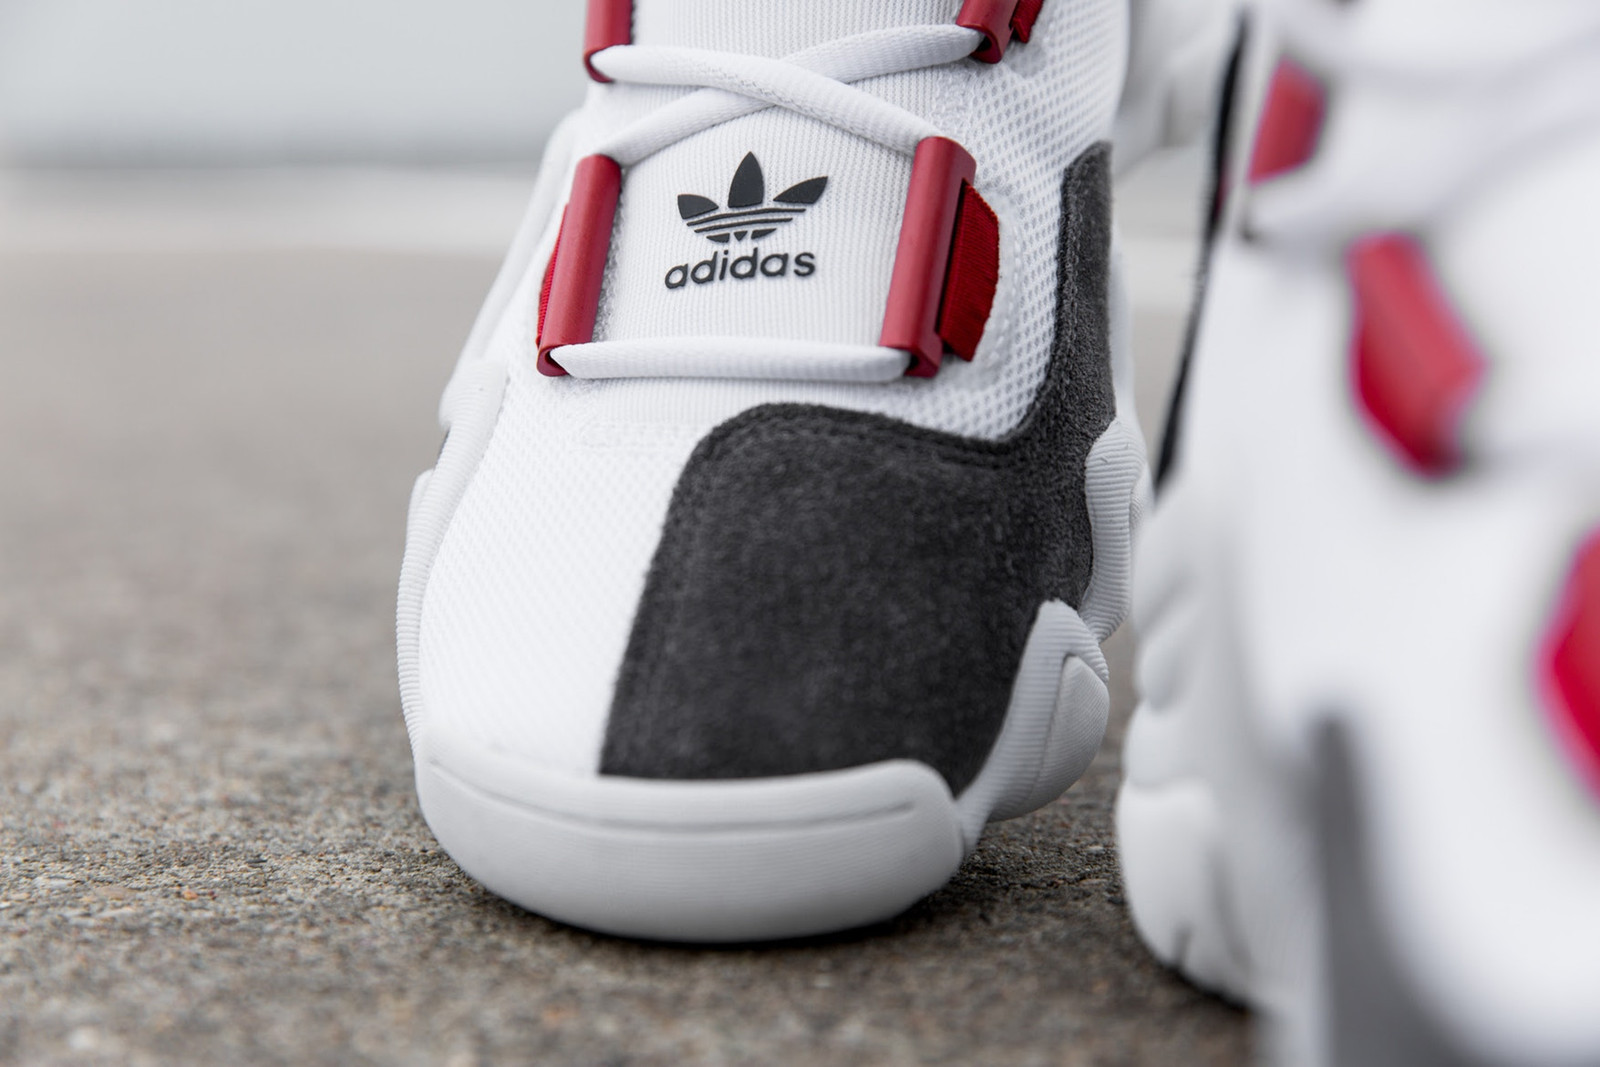 BAPE Dr. Martens 8-Eye Boot 3-Eye Shoe Raf Simons Eastpak adidas NMD CS1 Consortium Afura Garbstore Hanon Helmut Lang KM20 Peter Hujar Reebok Workout Lo Sanpak Sever Sneakersnstuff Soulland